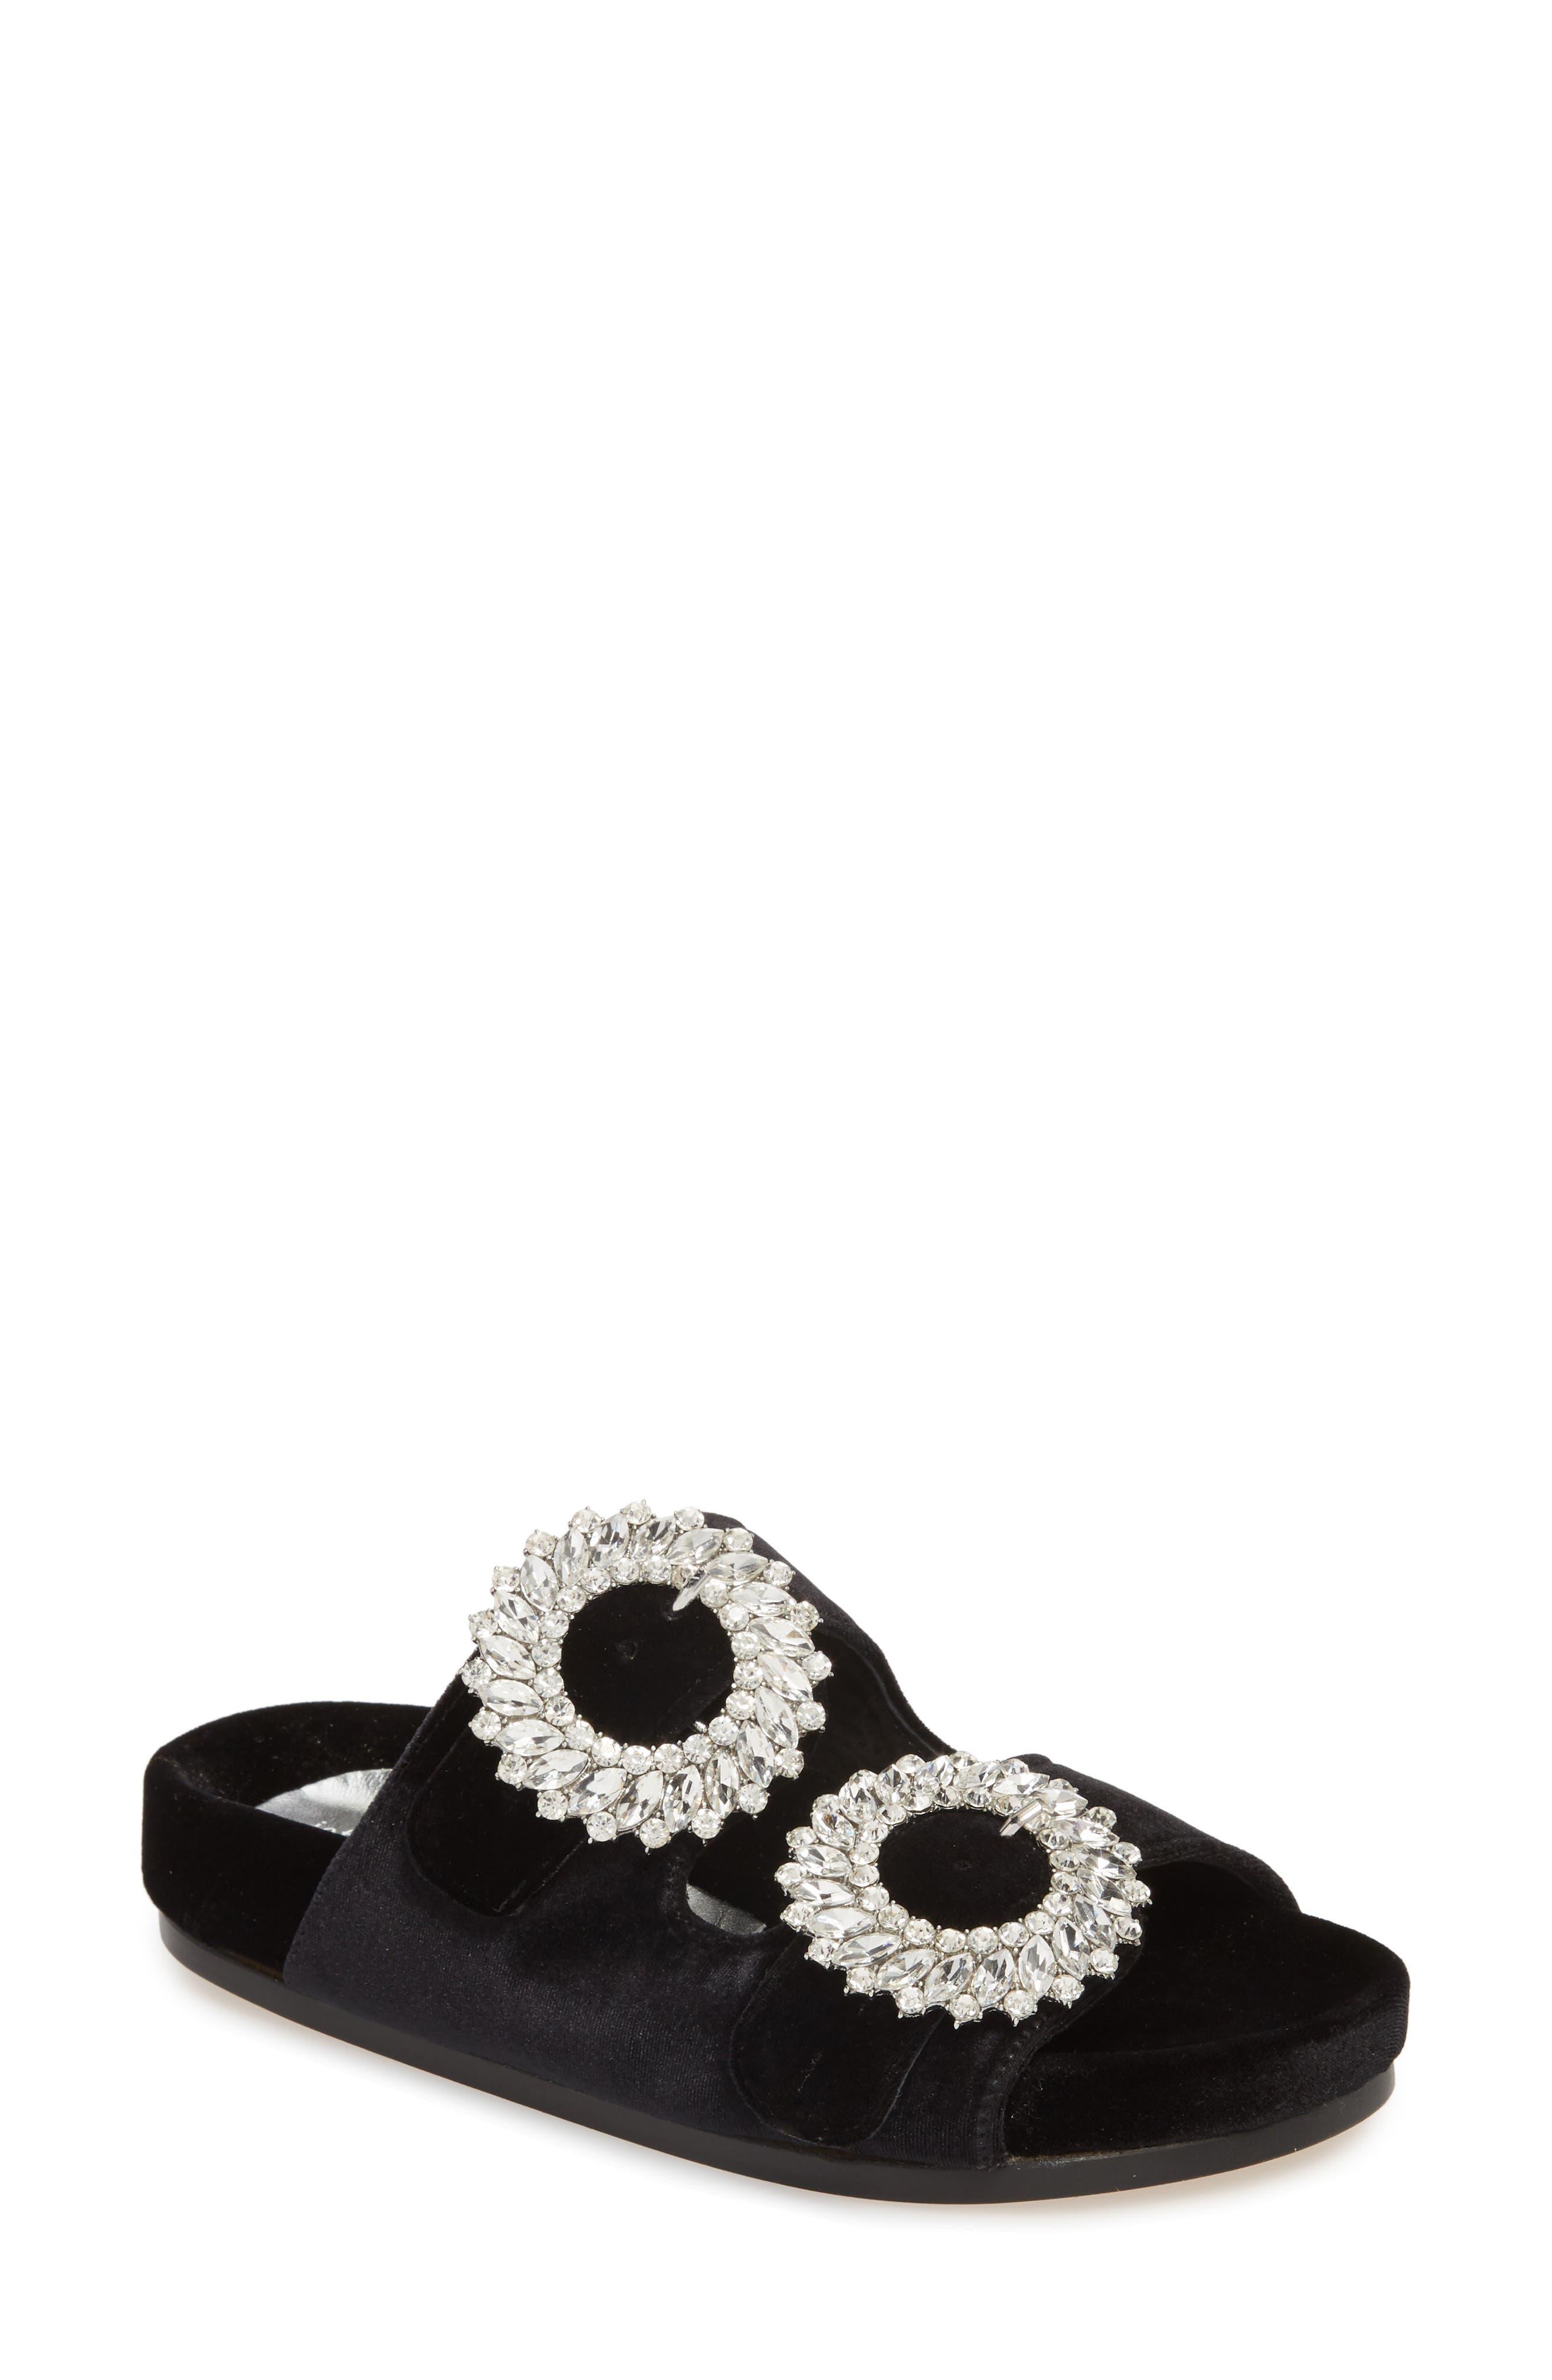 JEFFREY CAMPBELL,                             Izaro Embellished Slide Sandal,                             Main thumbnail 1, color,                             040